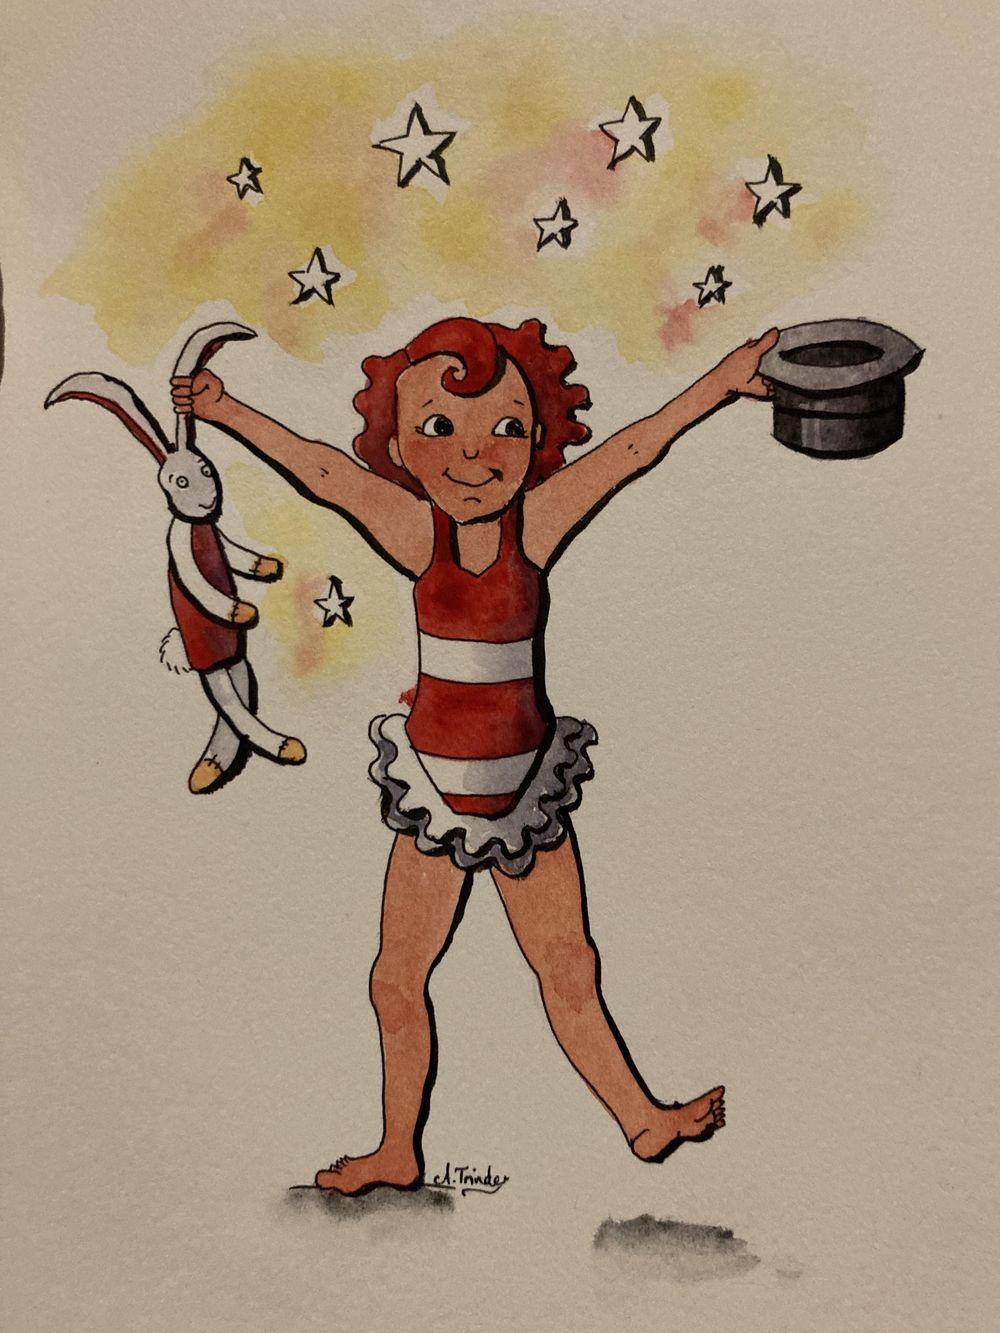 Watercolour magic: circus girl 5 ways! - image 2 - student project